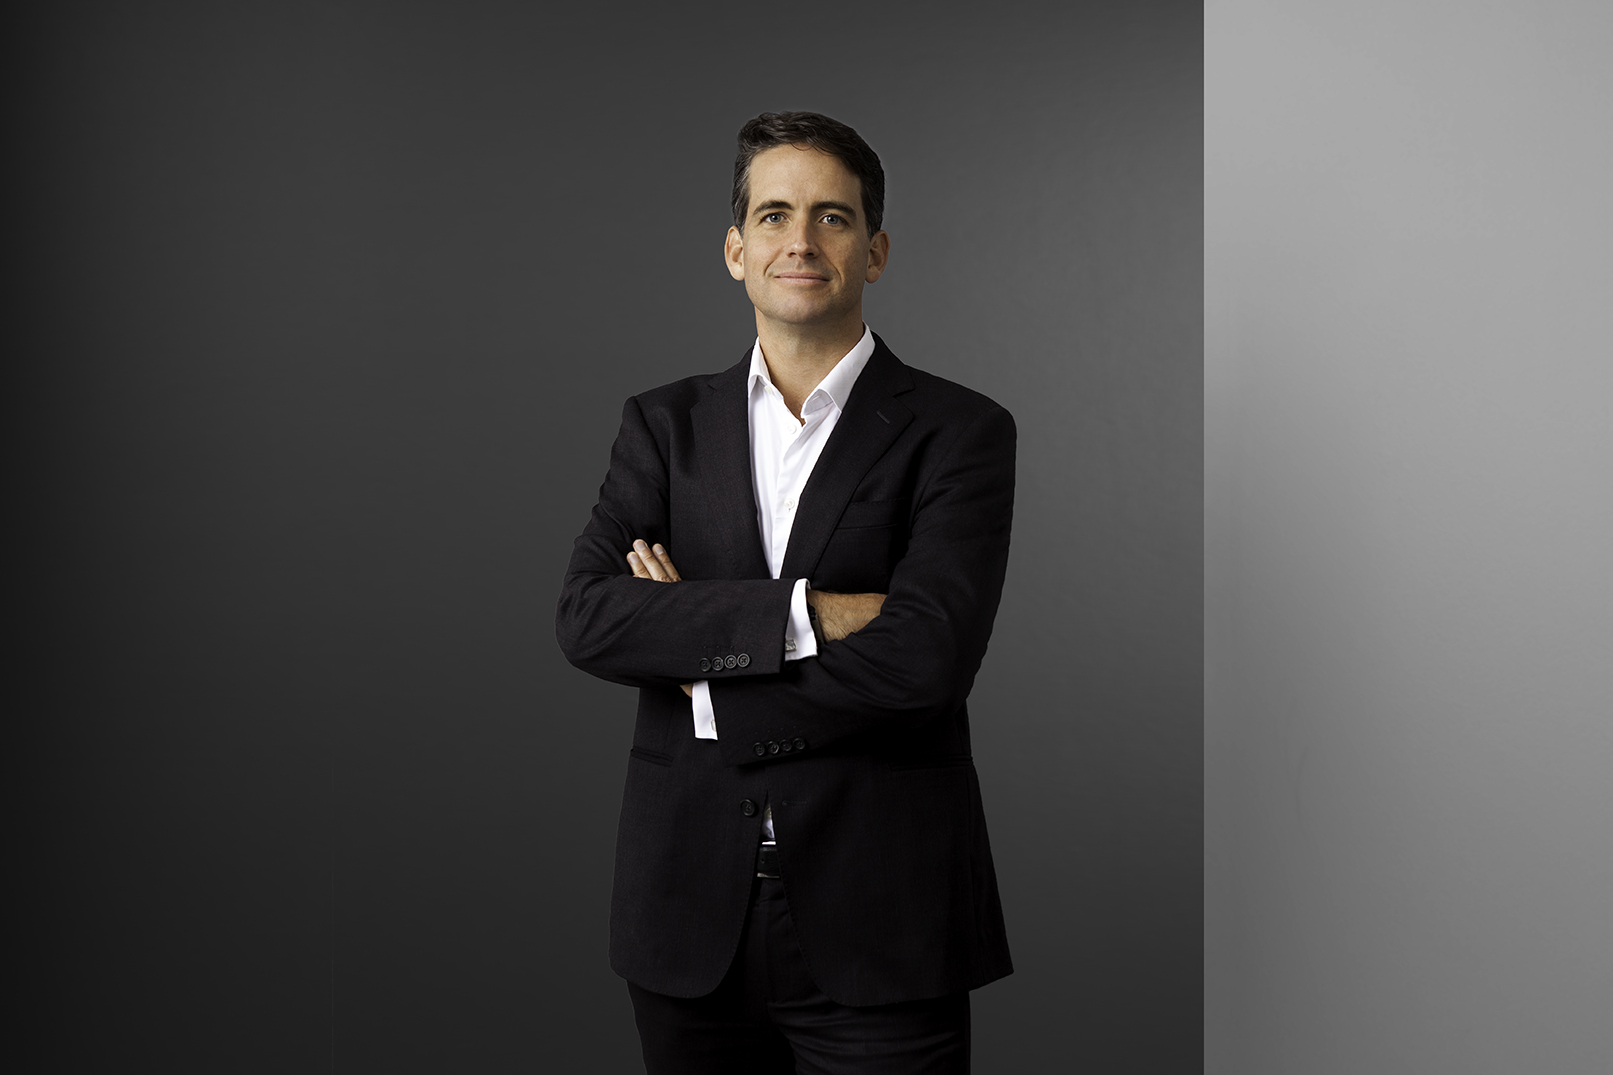 David Grose - Principal at OneVentures, leading Australian Venture Capital firm